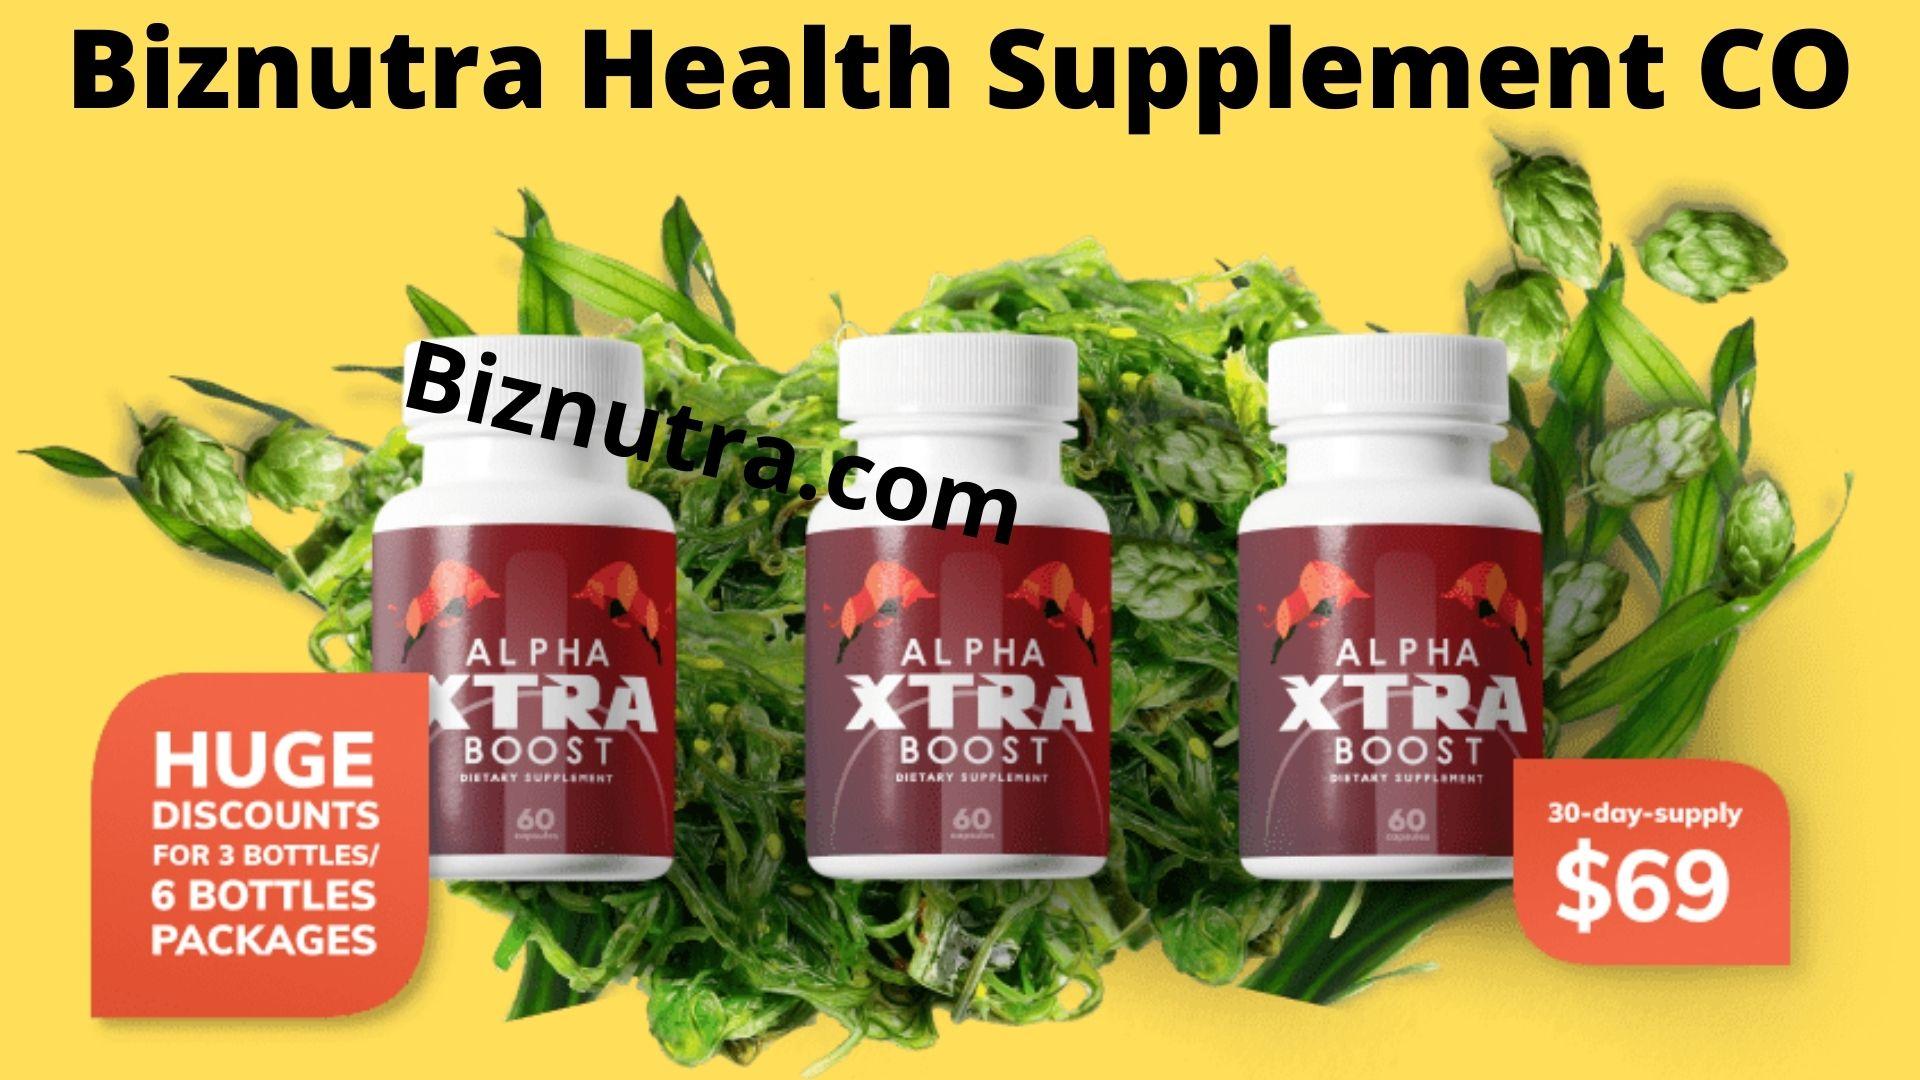 Alpha Xtra Boost Pills [Review] Sex Your Partner & Enjoy Order Now!